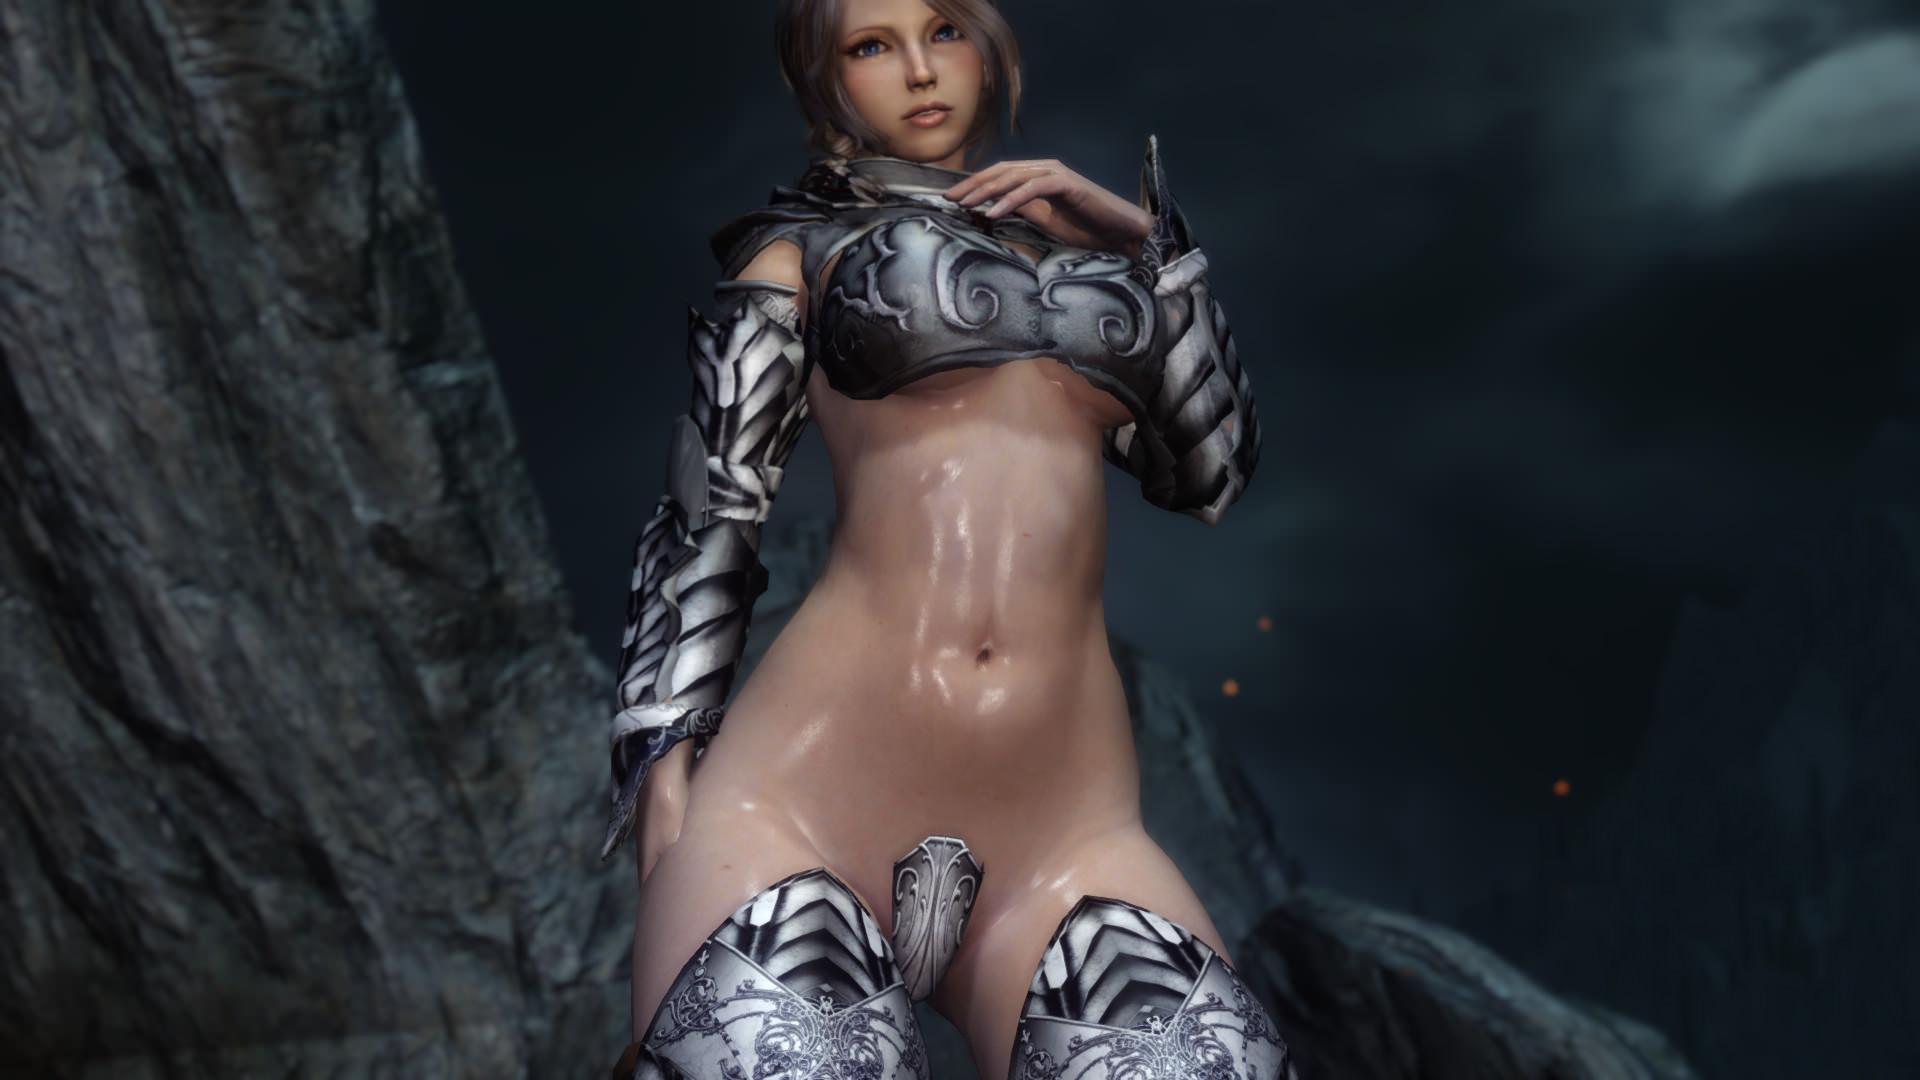 Princess leia metal bikini pictures